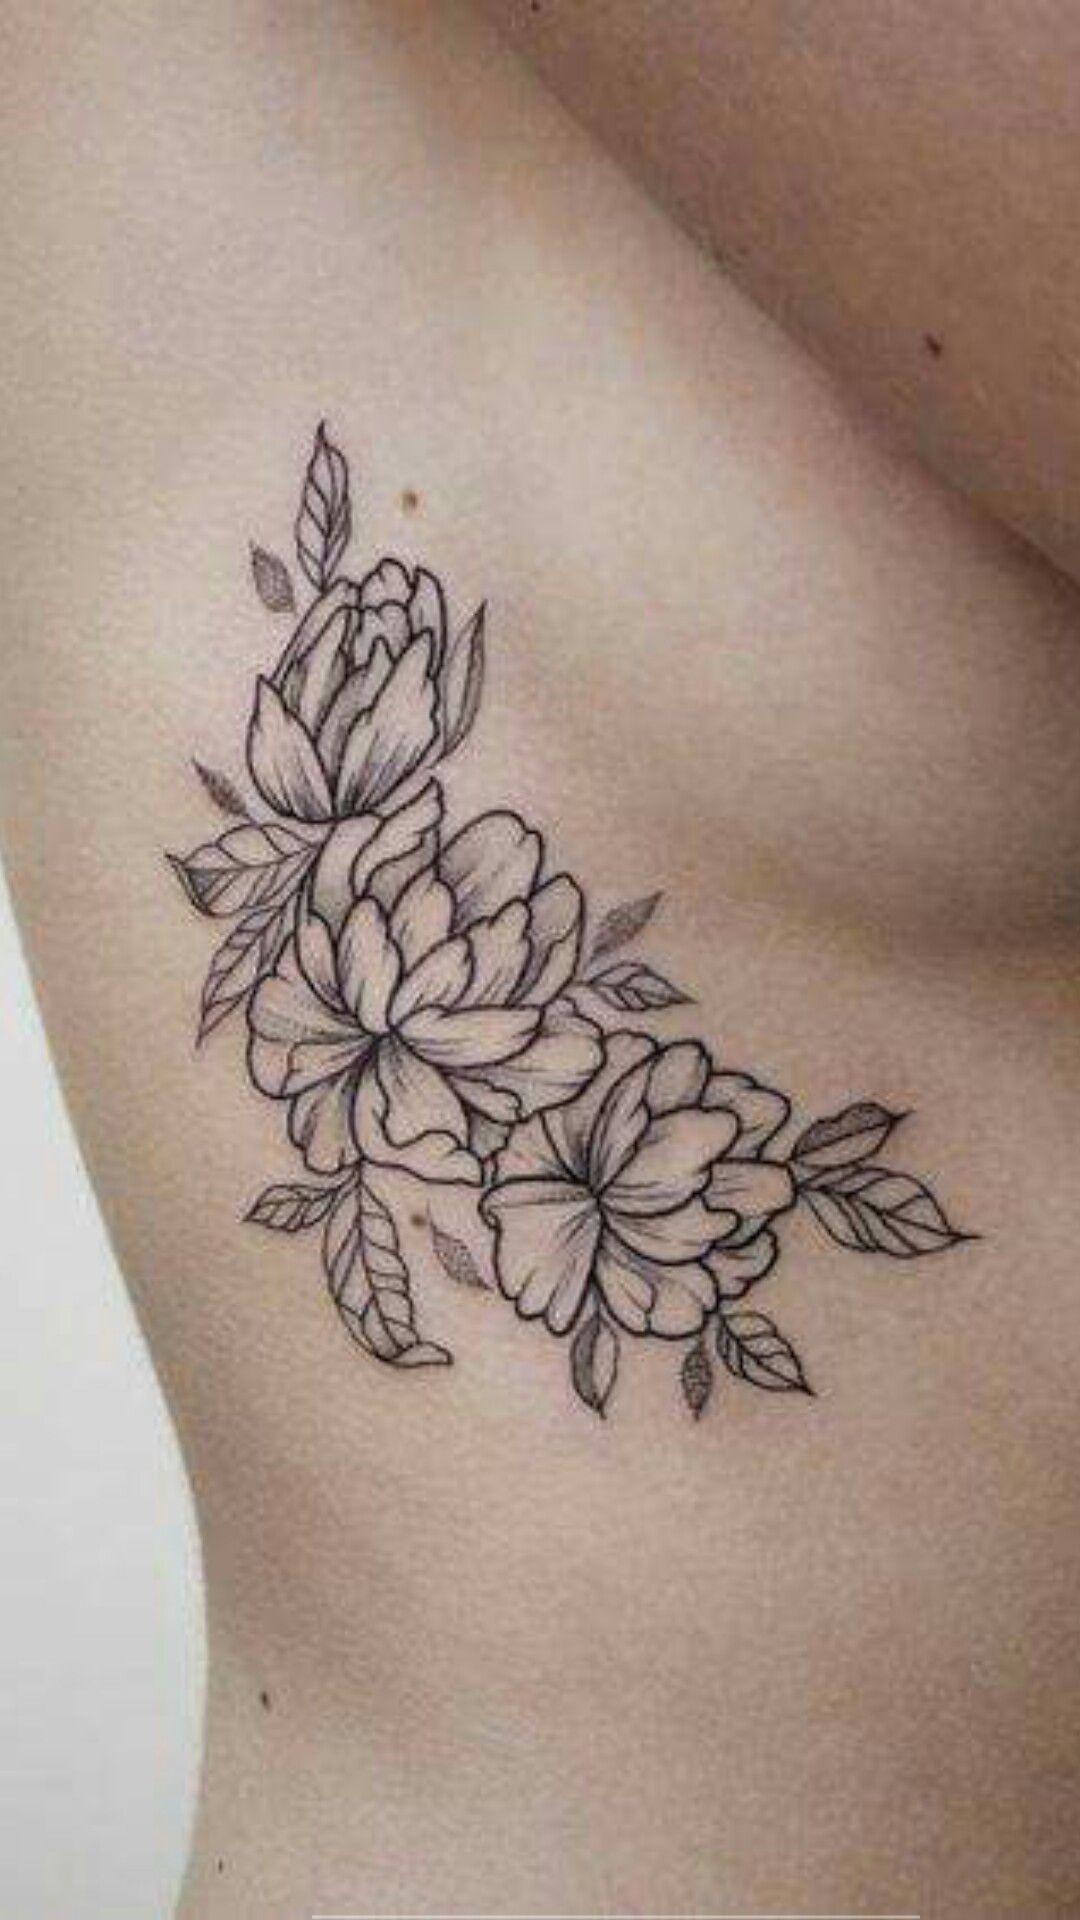 acc9e49d788d6 Floral side tattoo #beauty #ribcage #flowers #tattoopin #bodyart ...